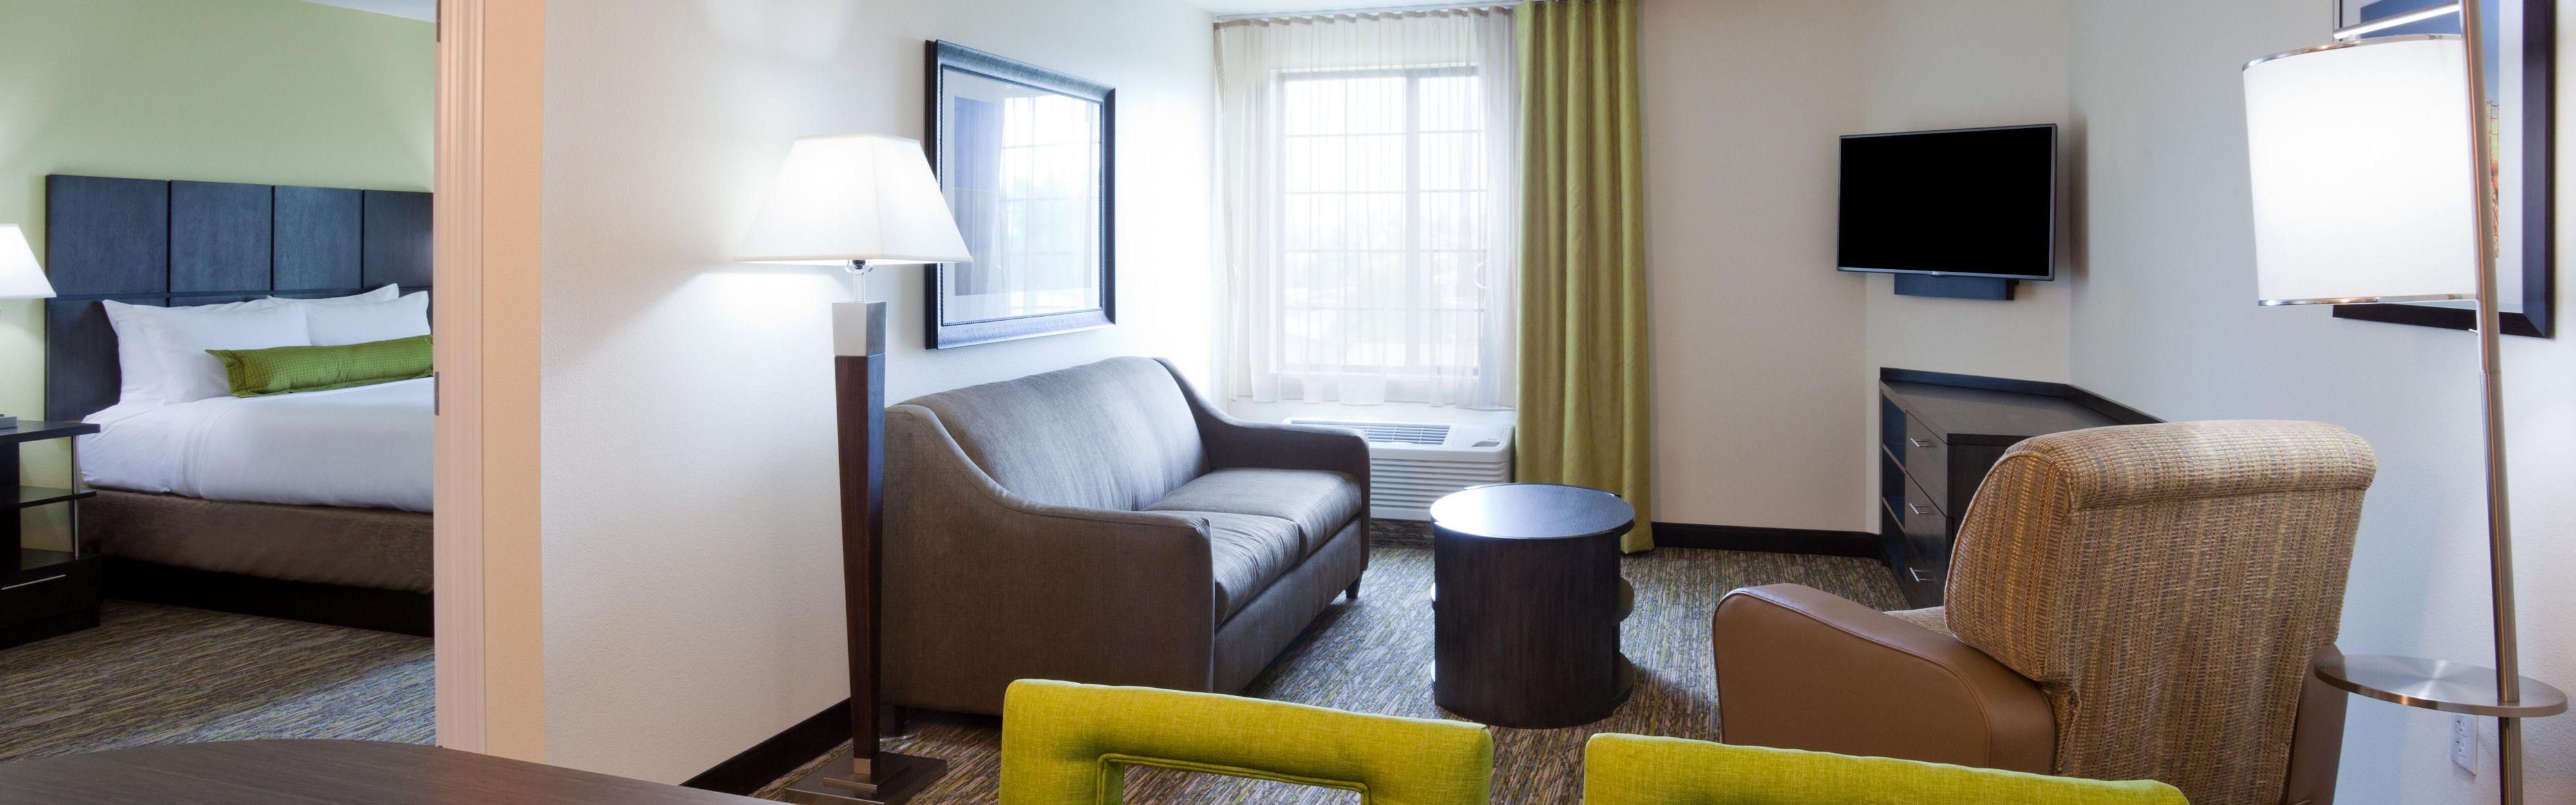 Candlewood Suites Longmont image 1